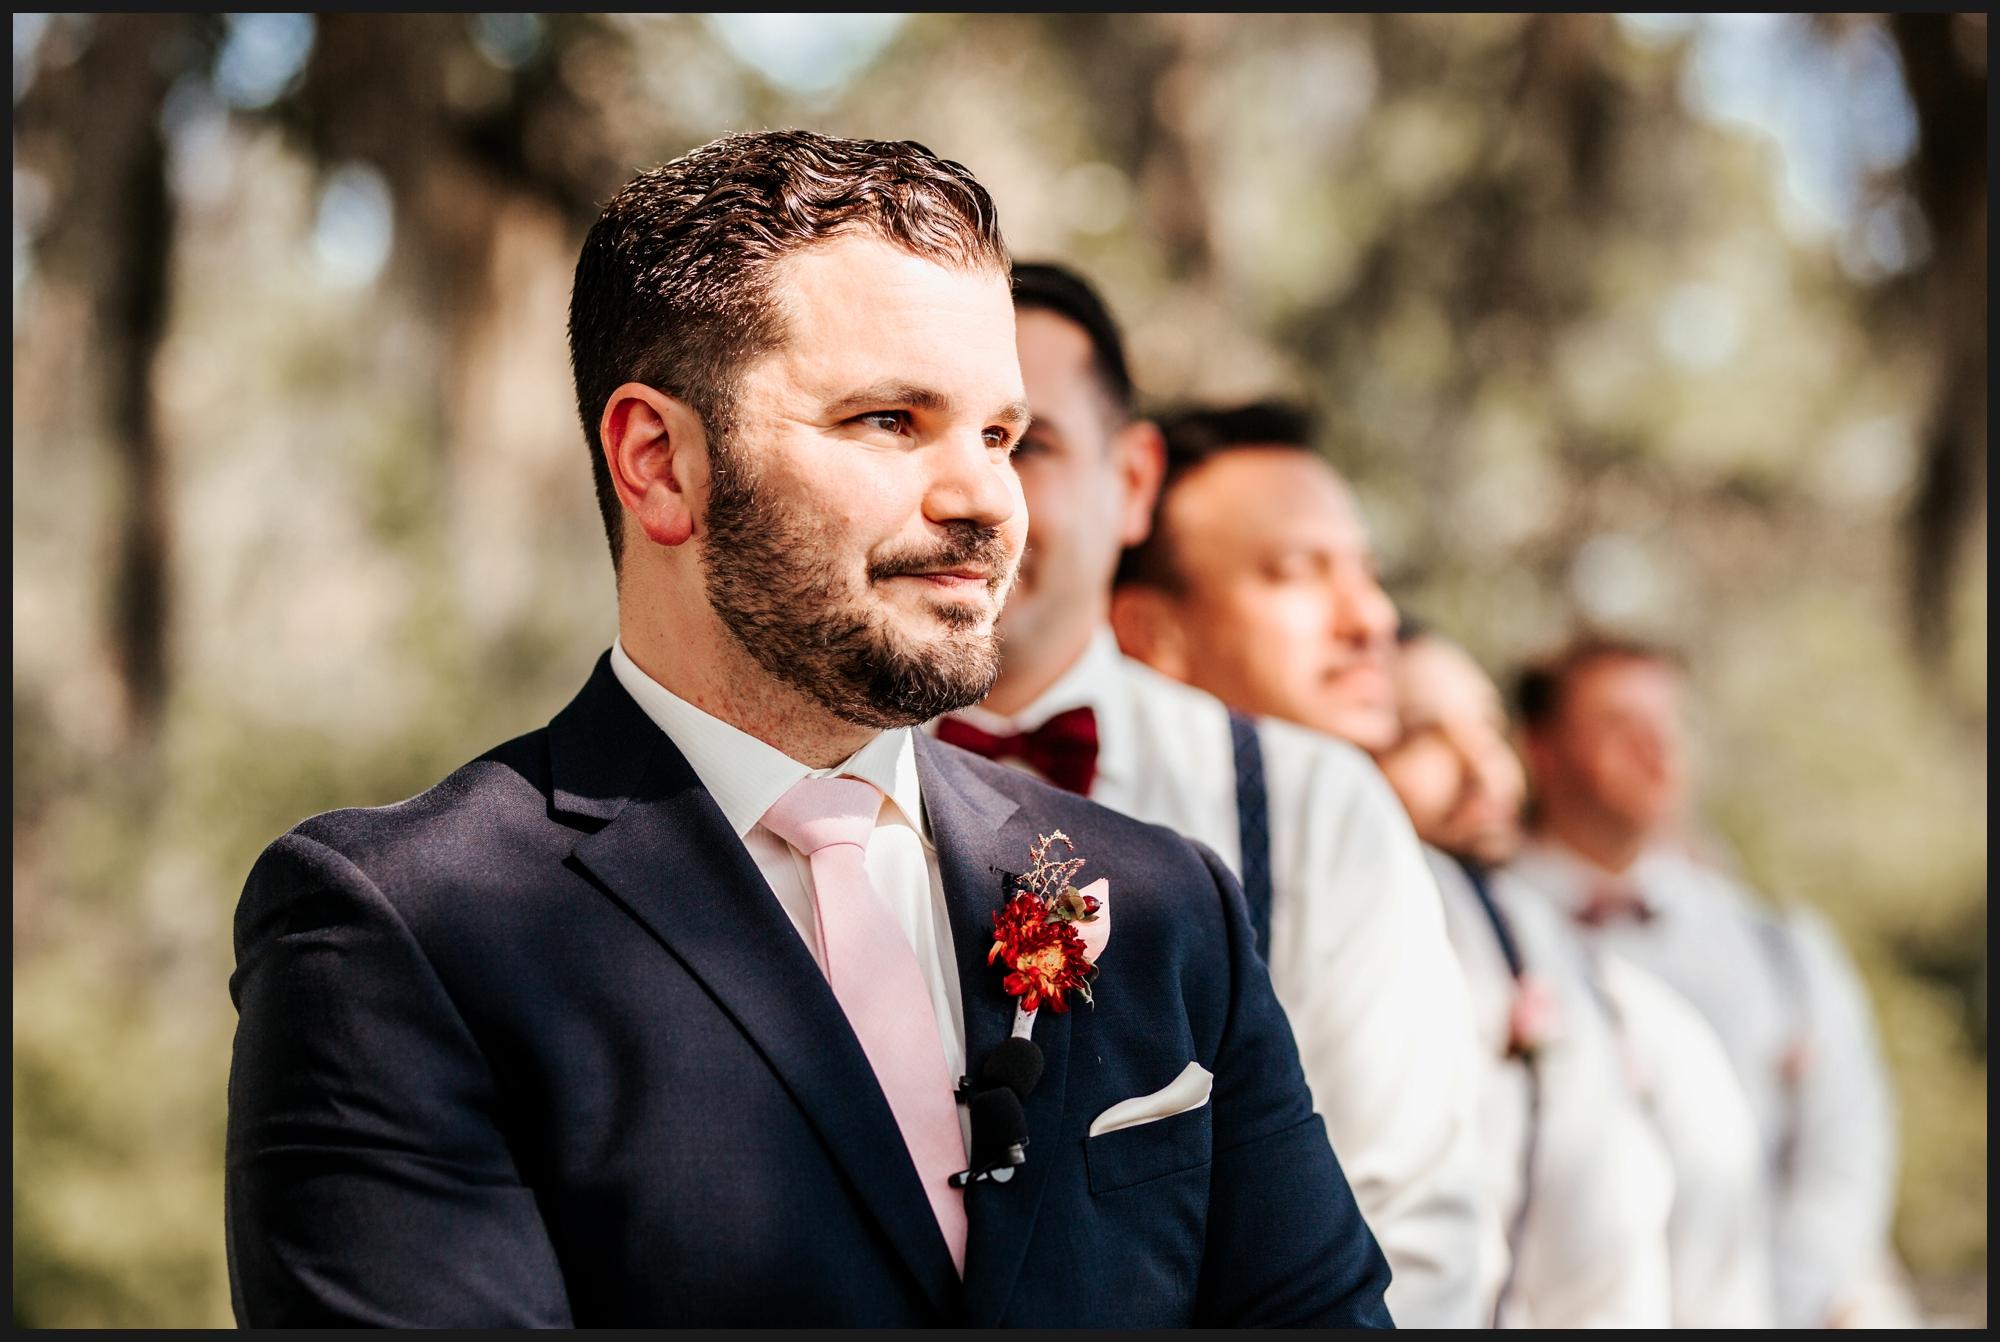 Orlando-Wedding-Photographer-destination-wedding-photographer-florida-wedding-photographer-hawaii-wedding-photographer_0591.jpg